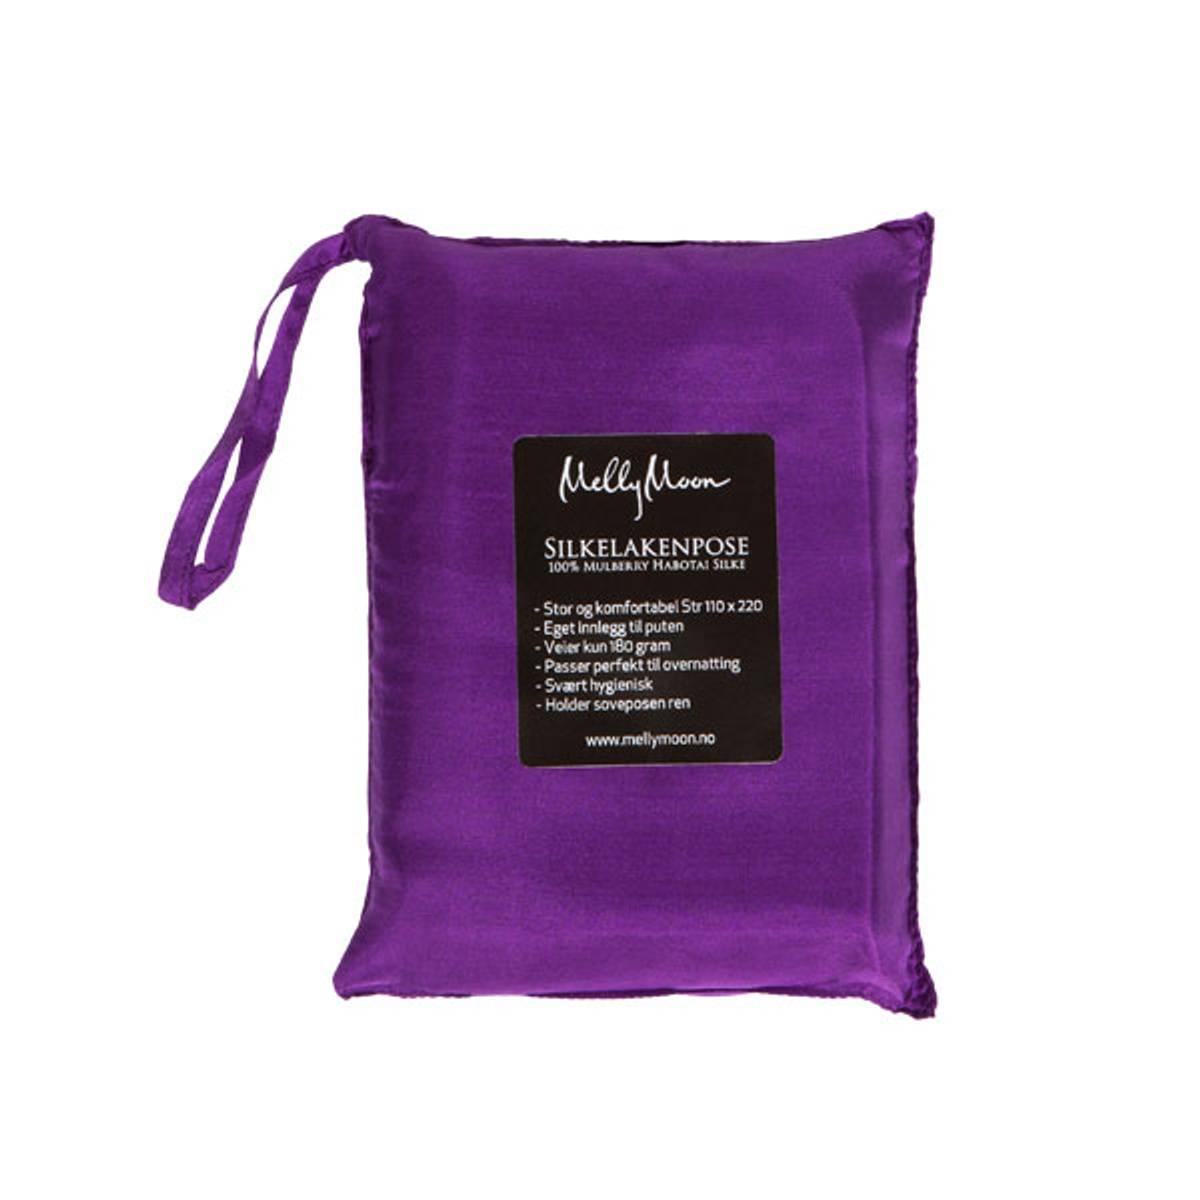 Silkelakenpose - lilla